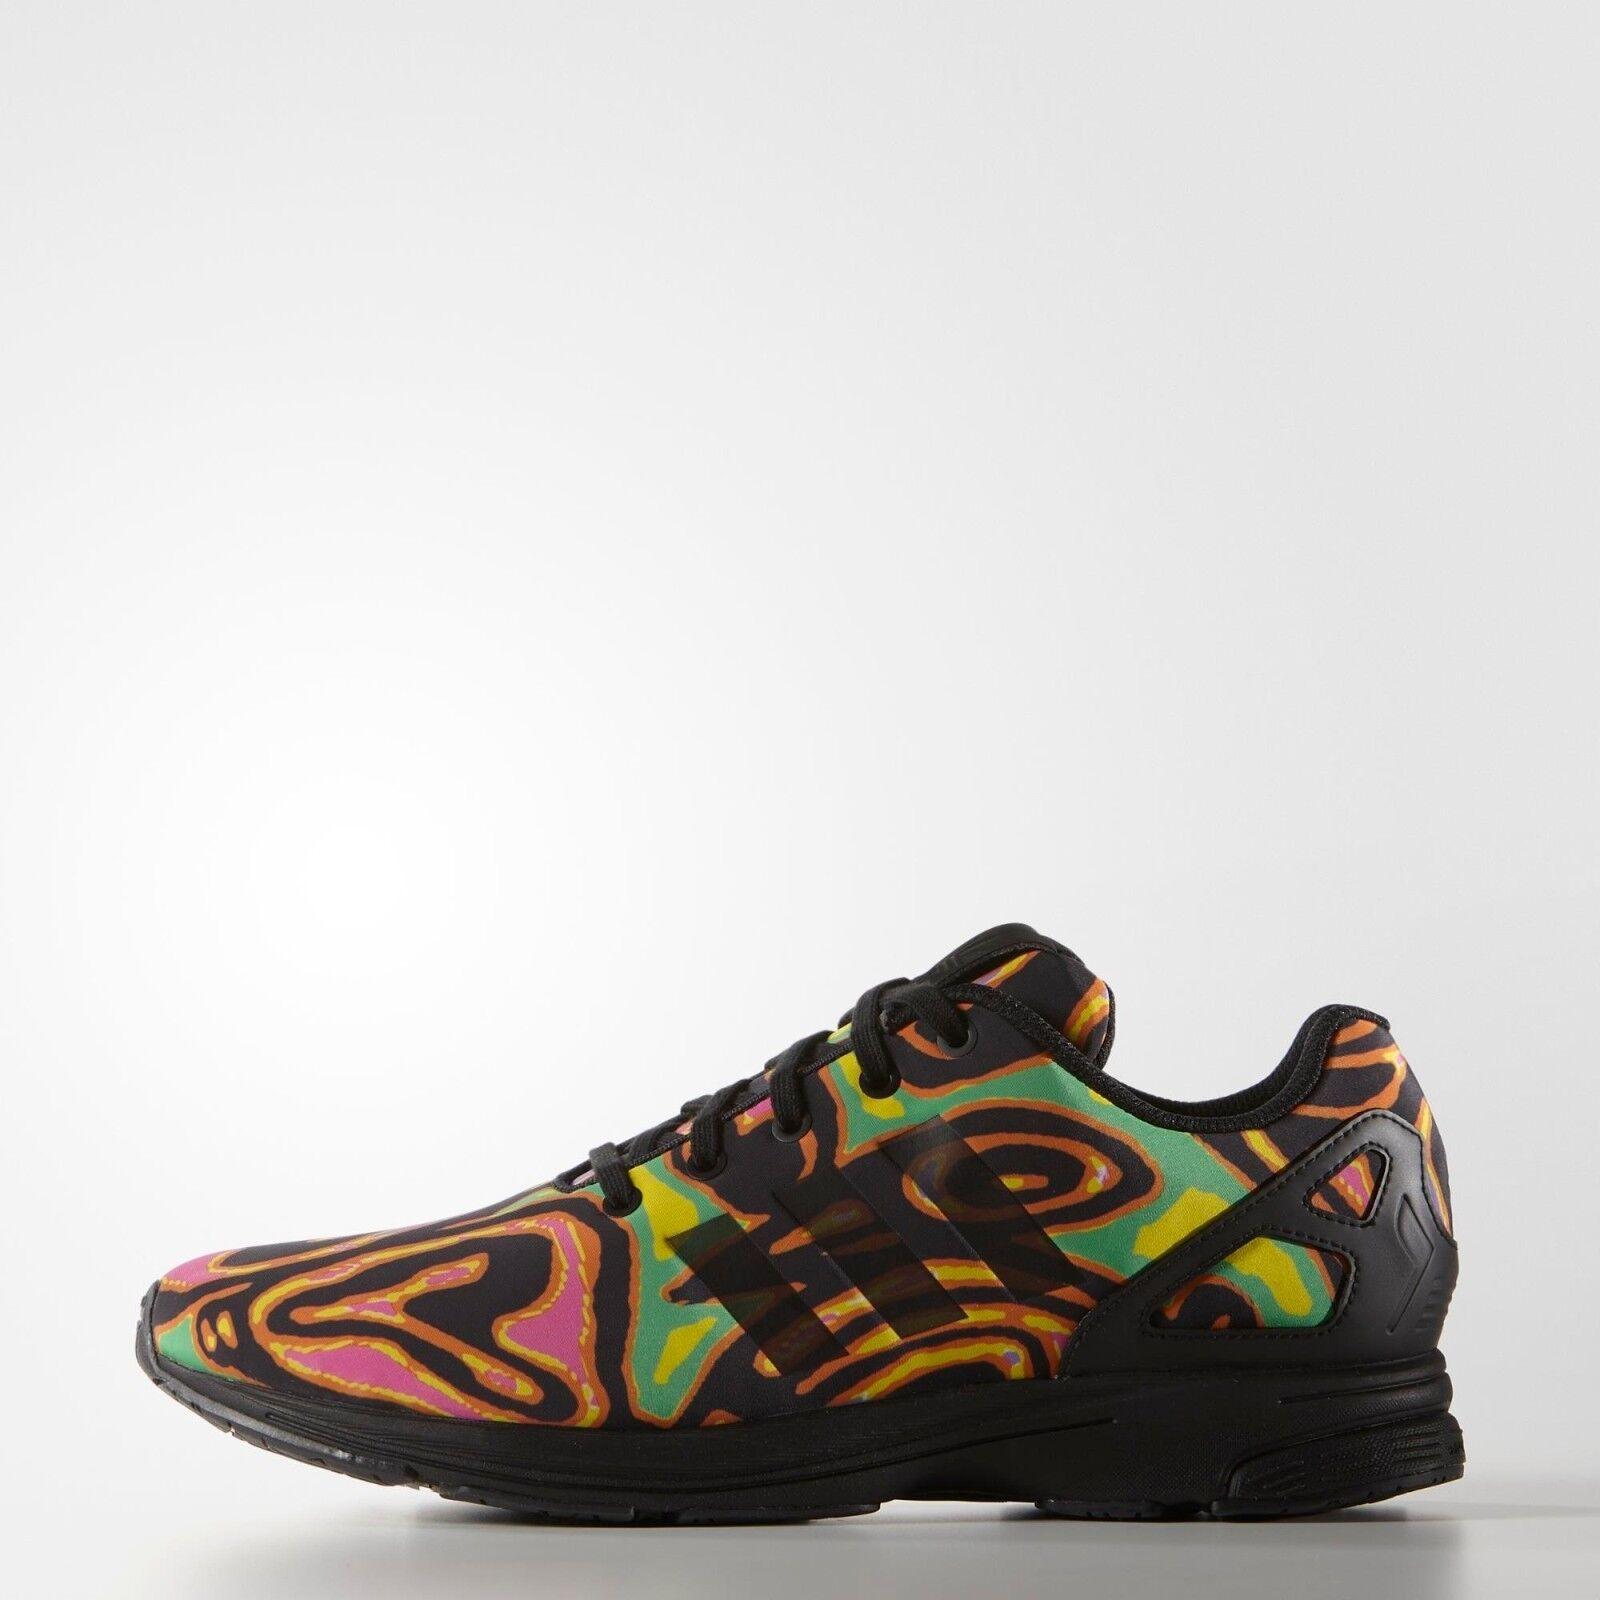 limited noir & new adidas ultra boost 1.0